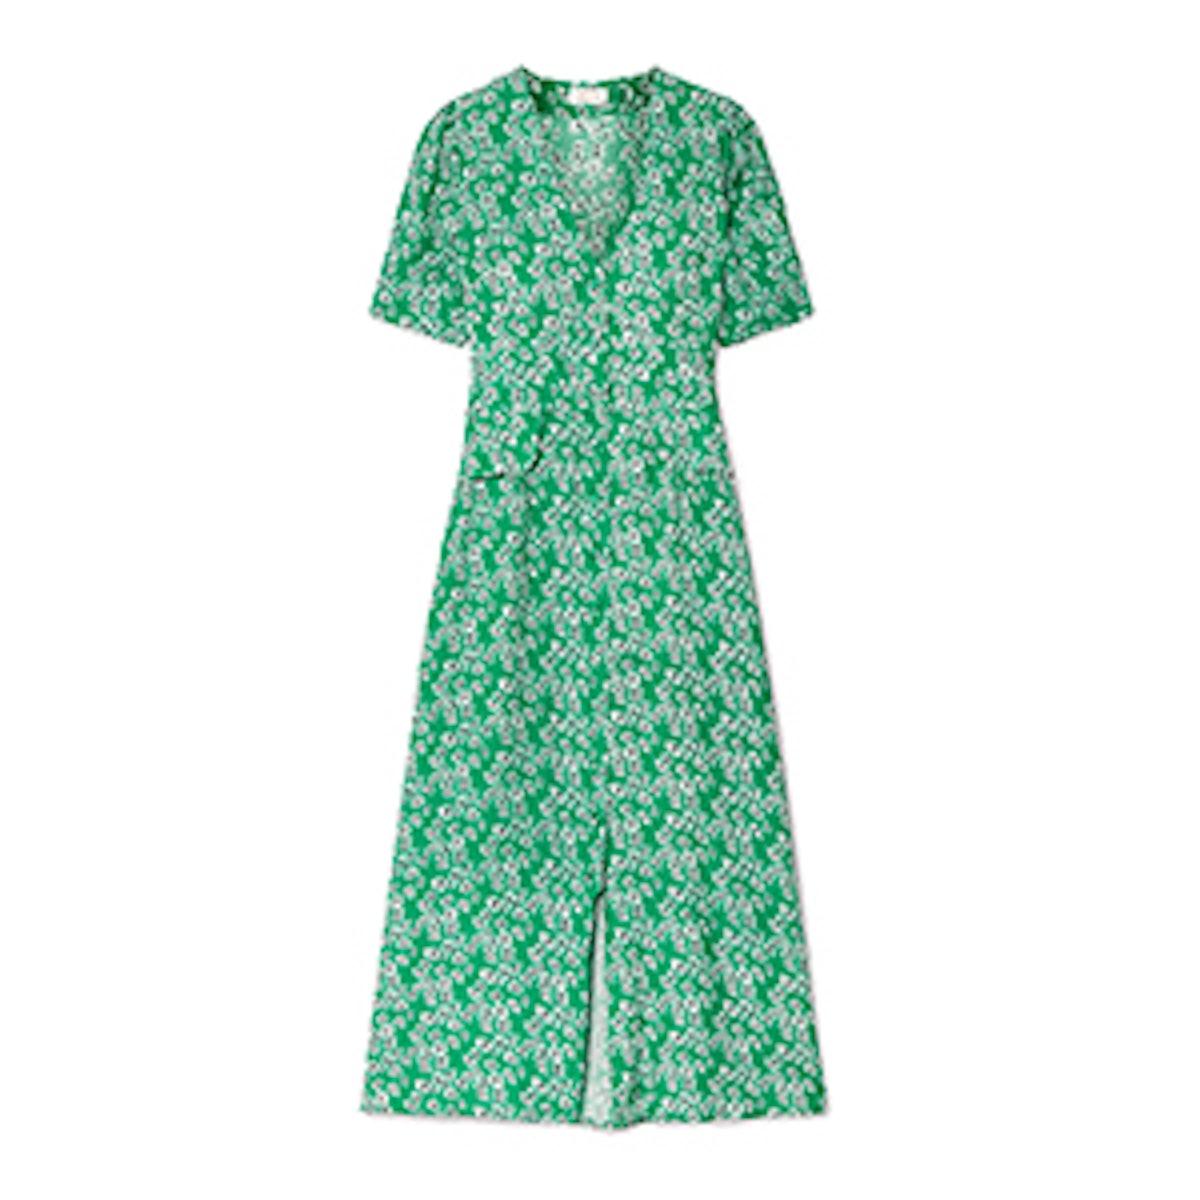 Jackson Floral-Print Crepe De Chine Midi Dress